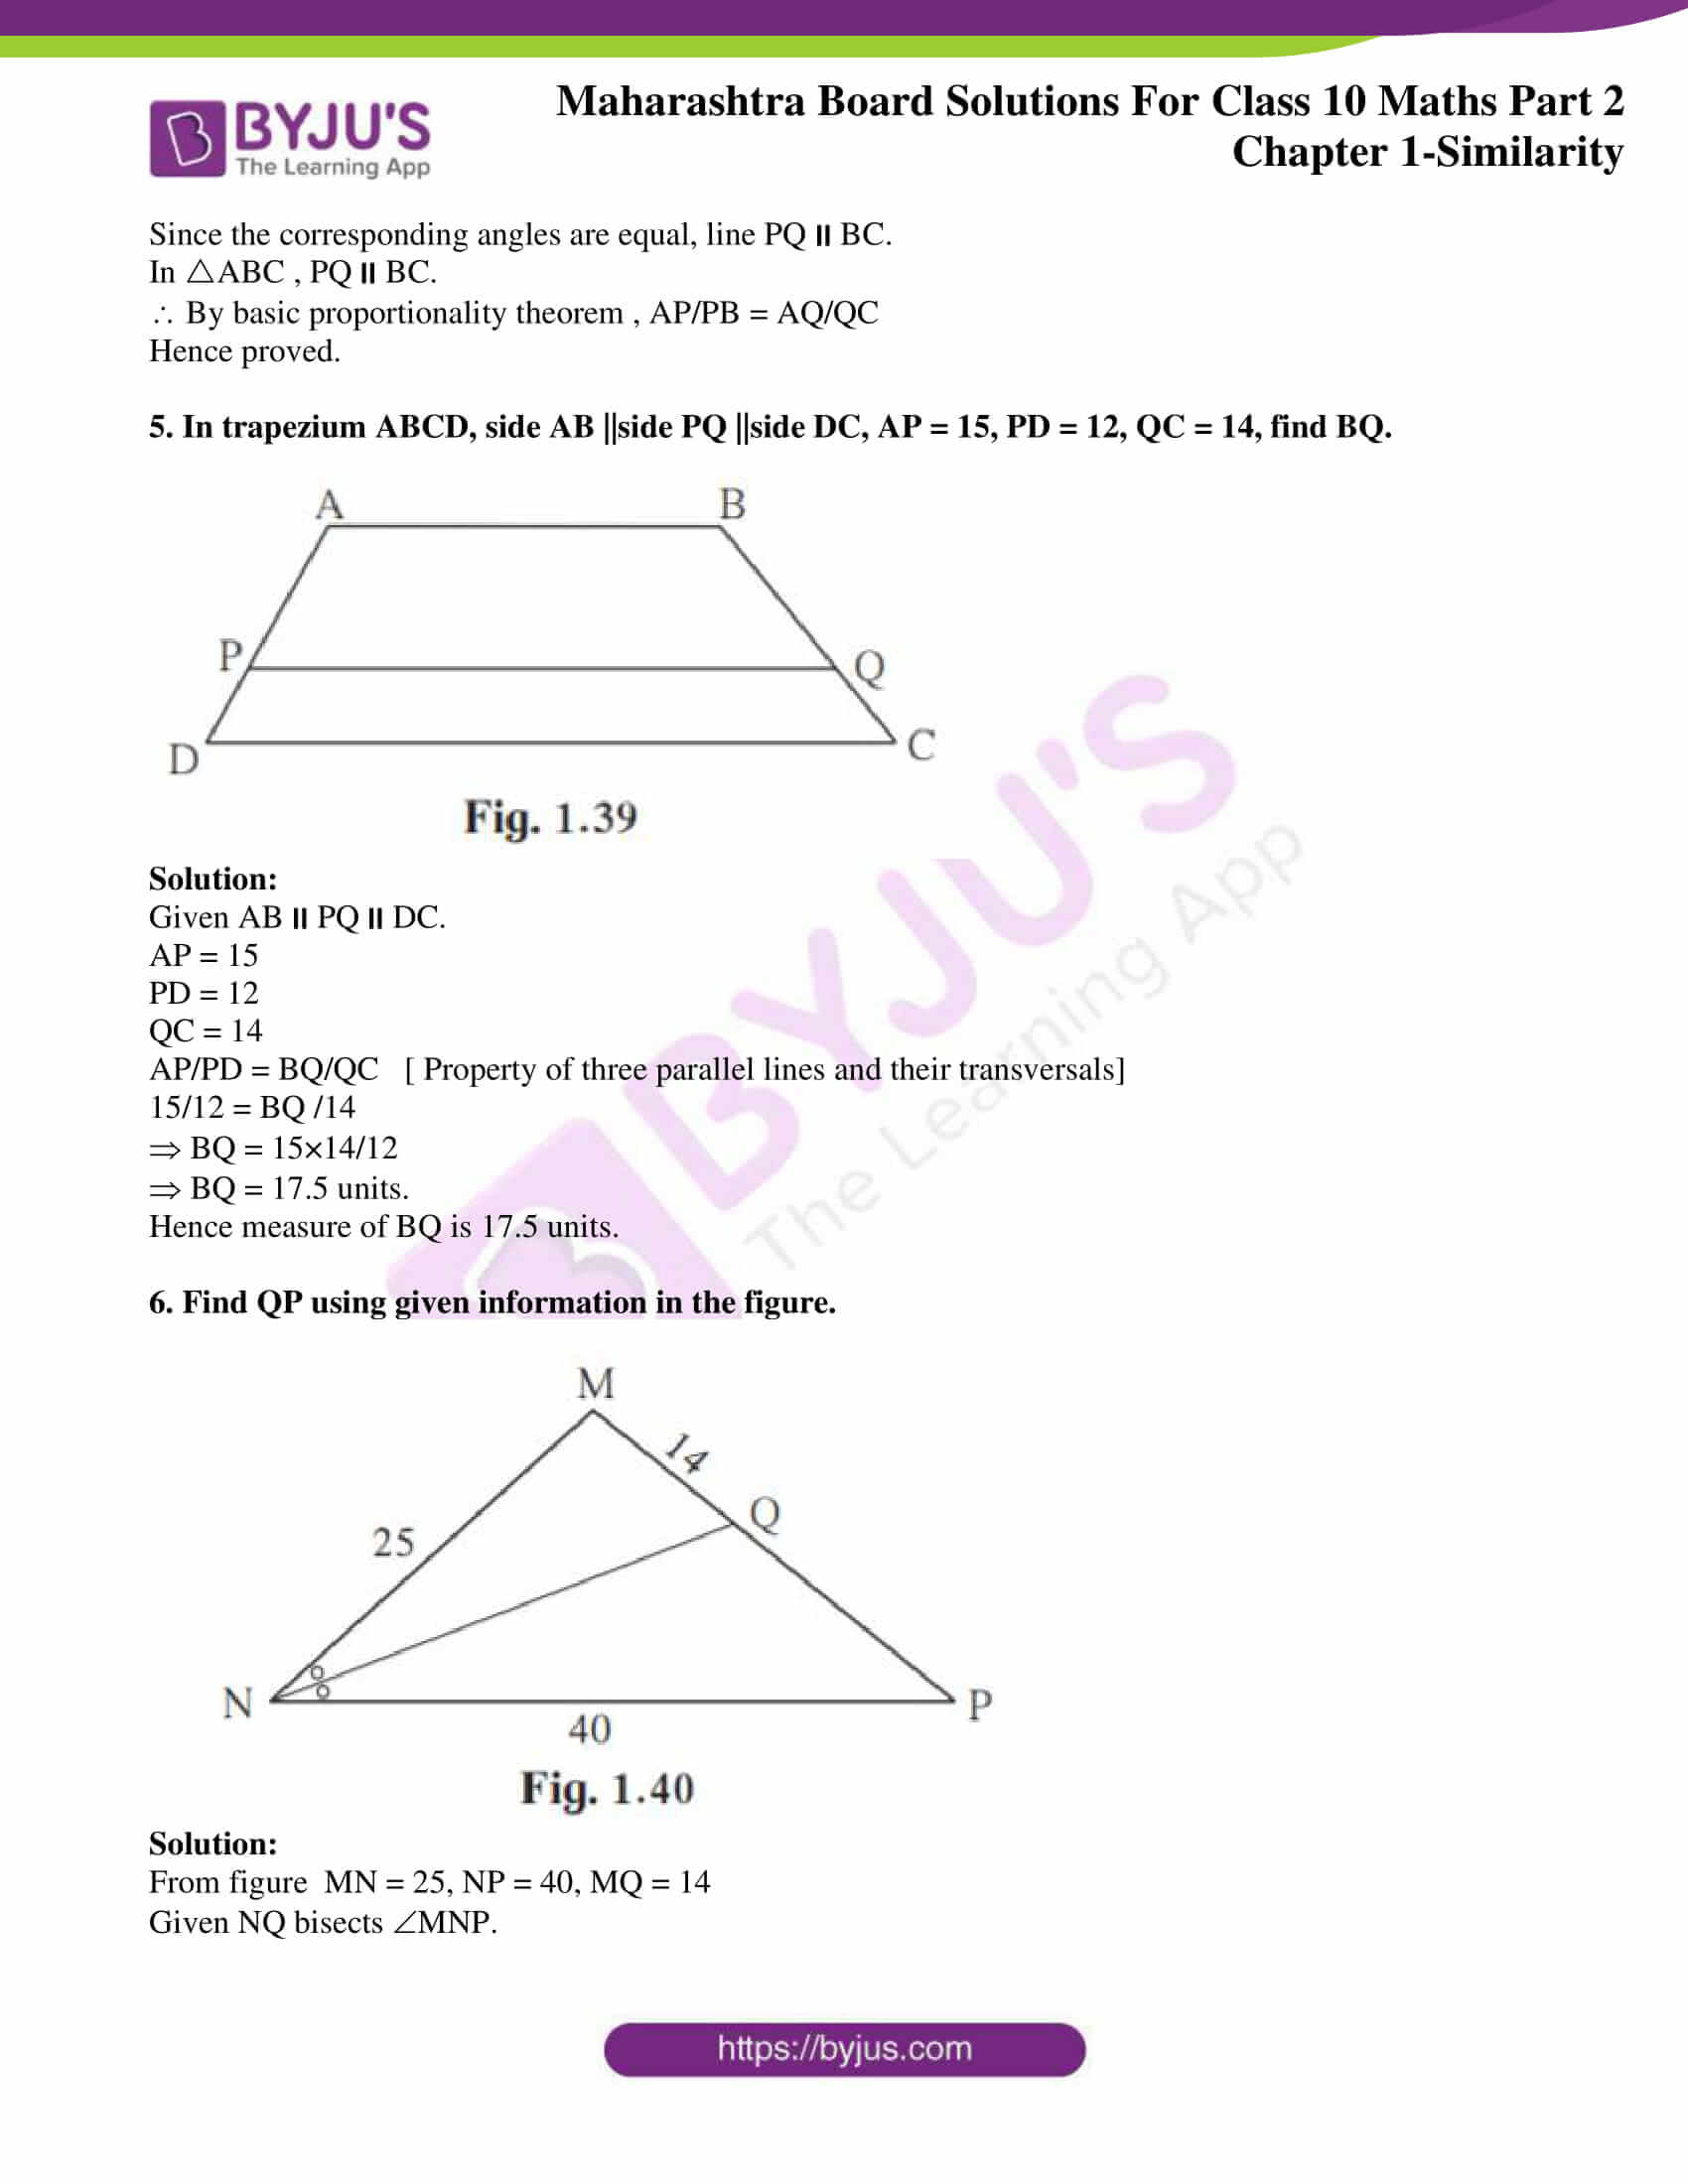 msbshse sol class 10 maths part 2 chapter 1 08